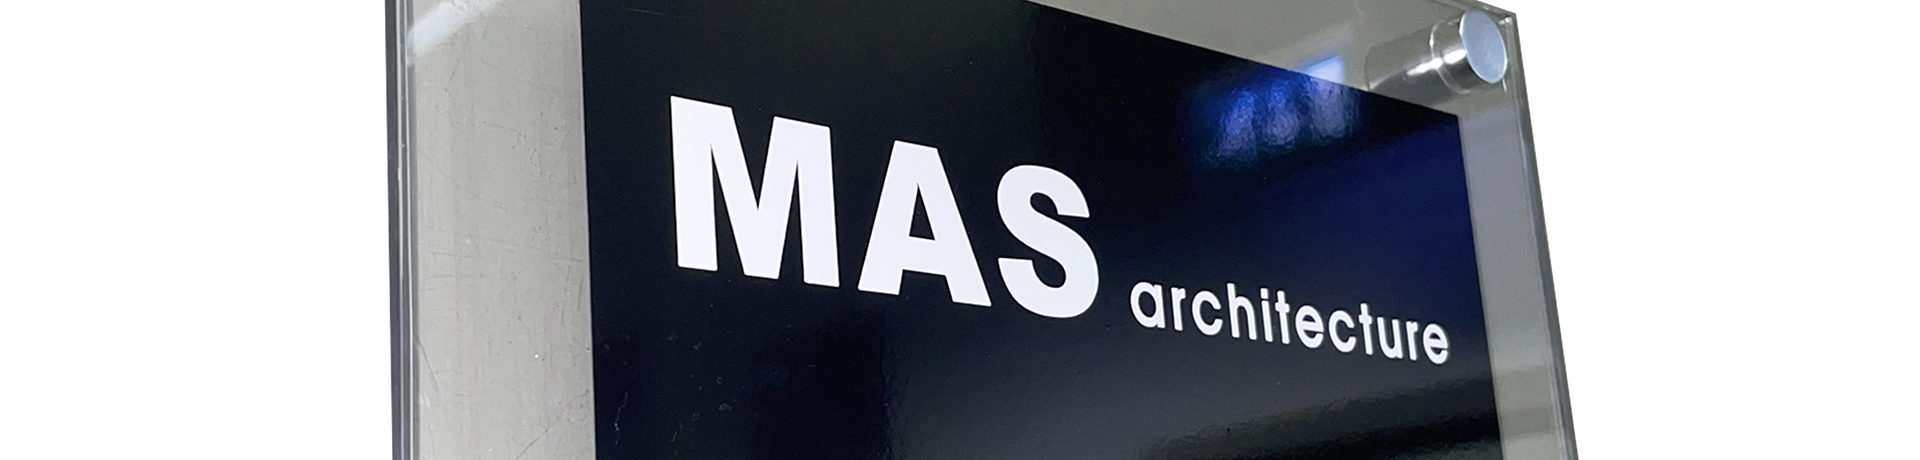 MAS Architecture